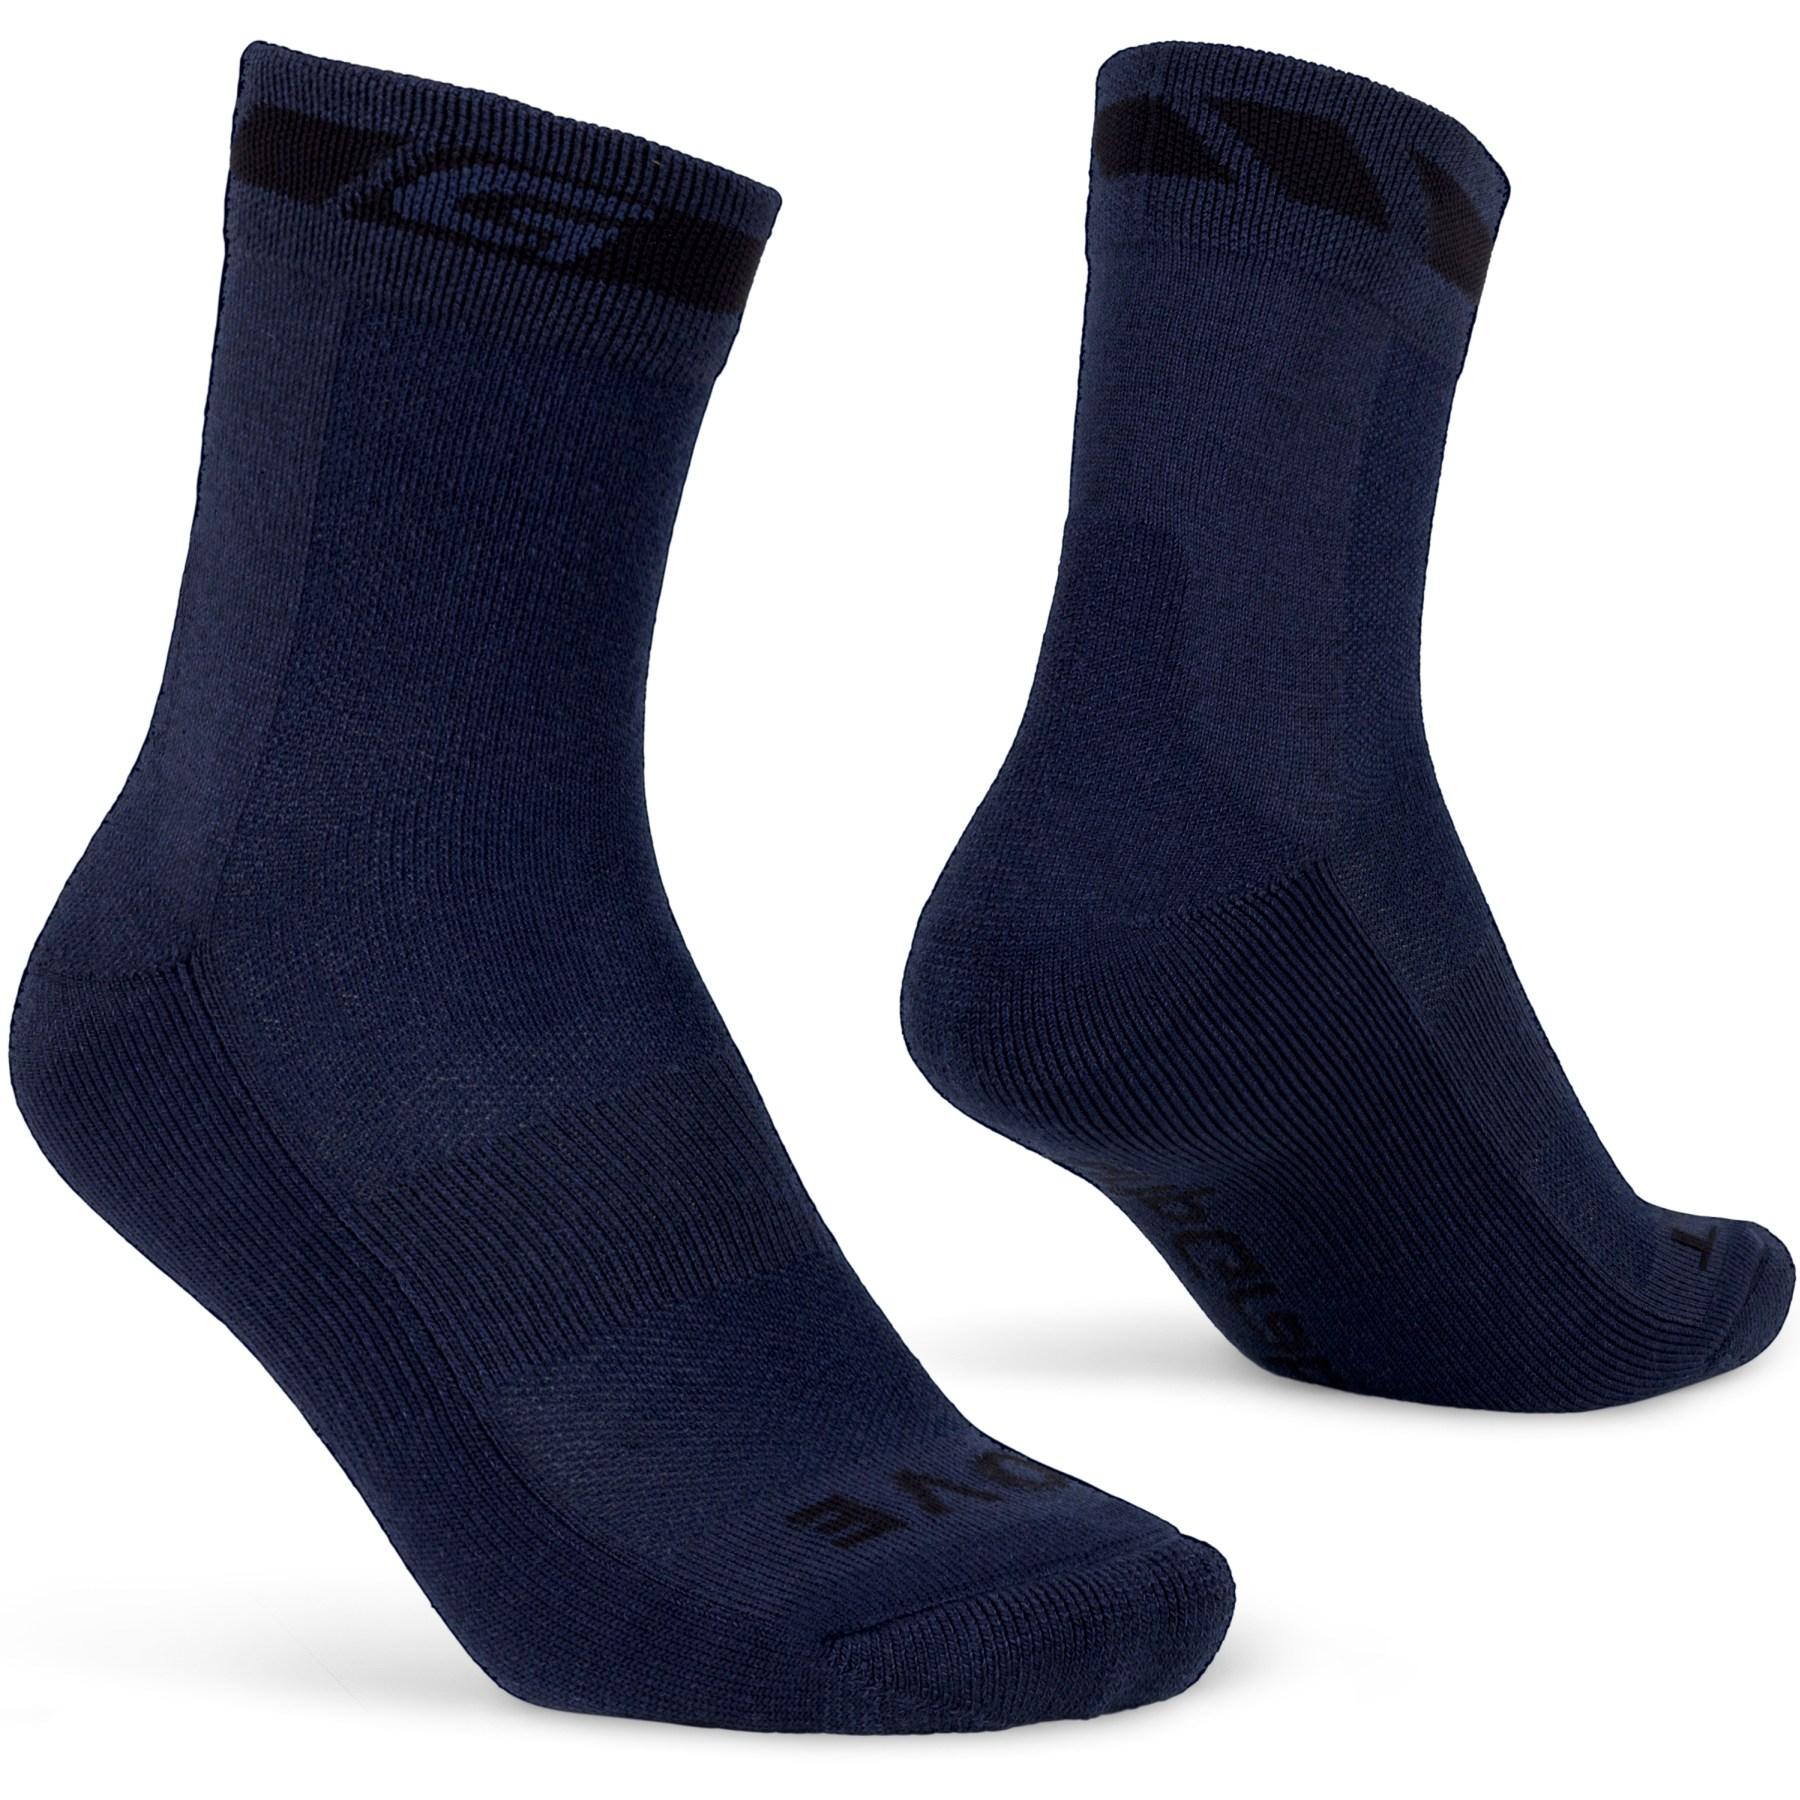 GripGrab Merino Winter Sock - Navy Blue